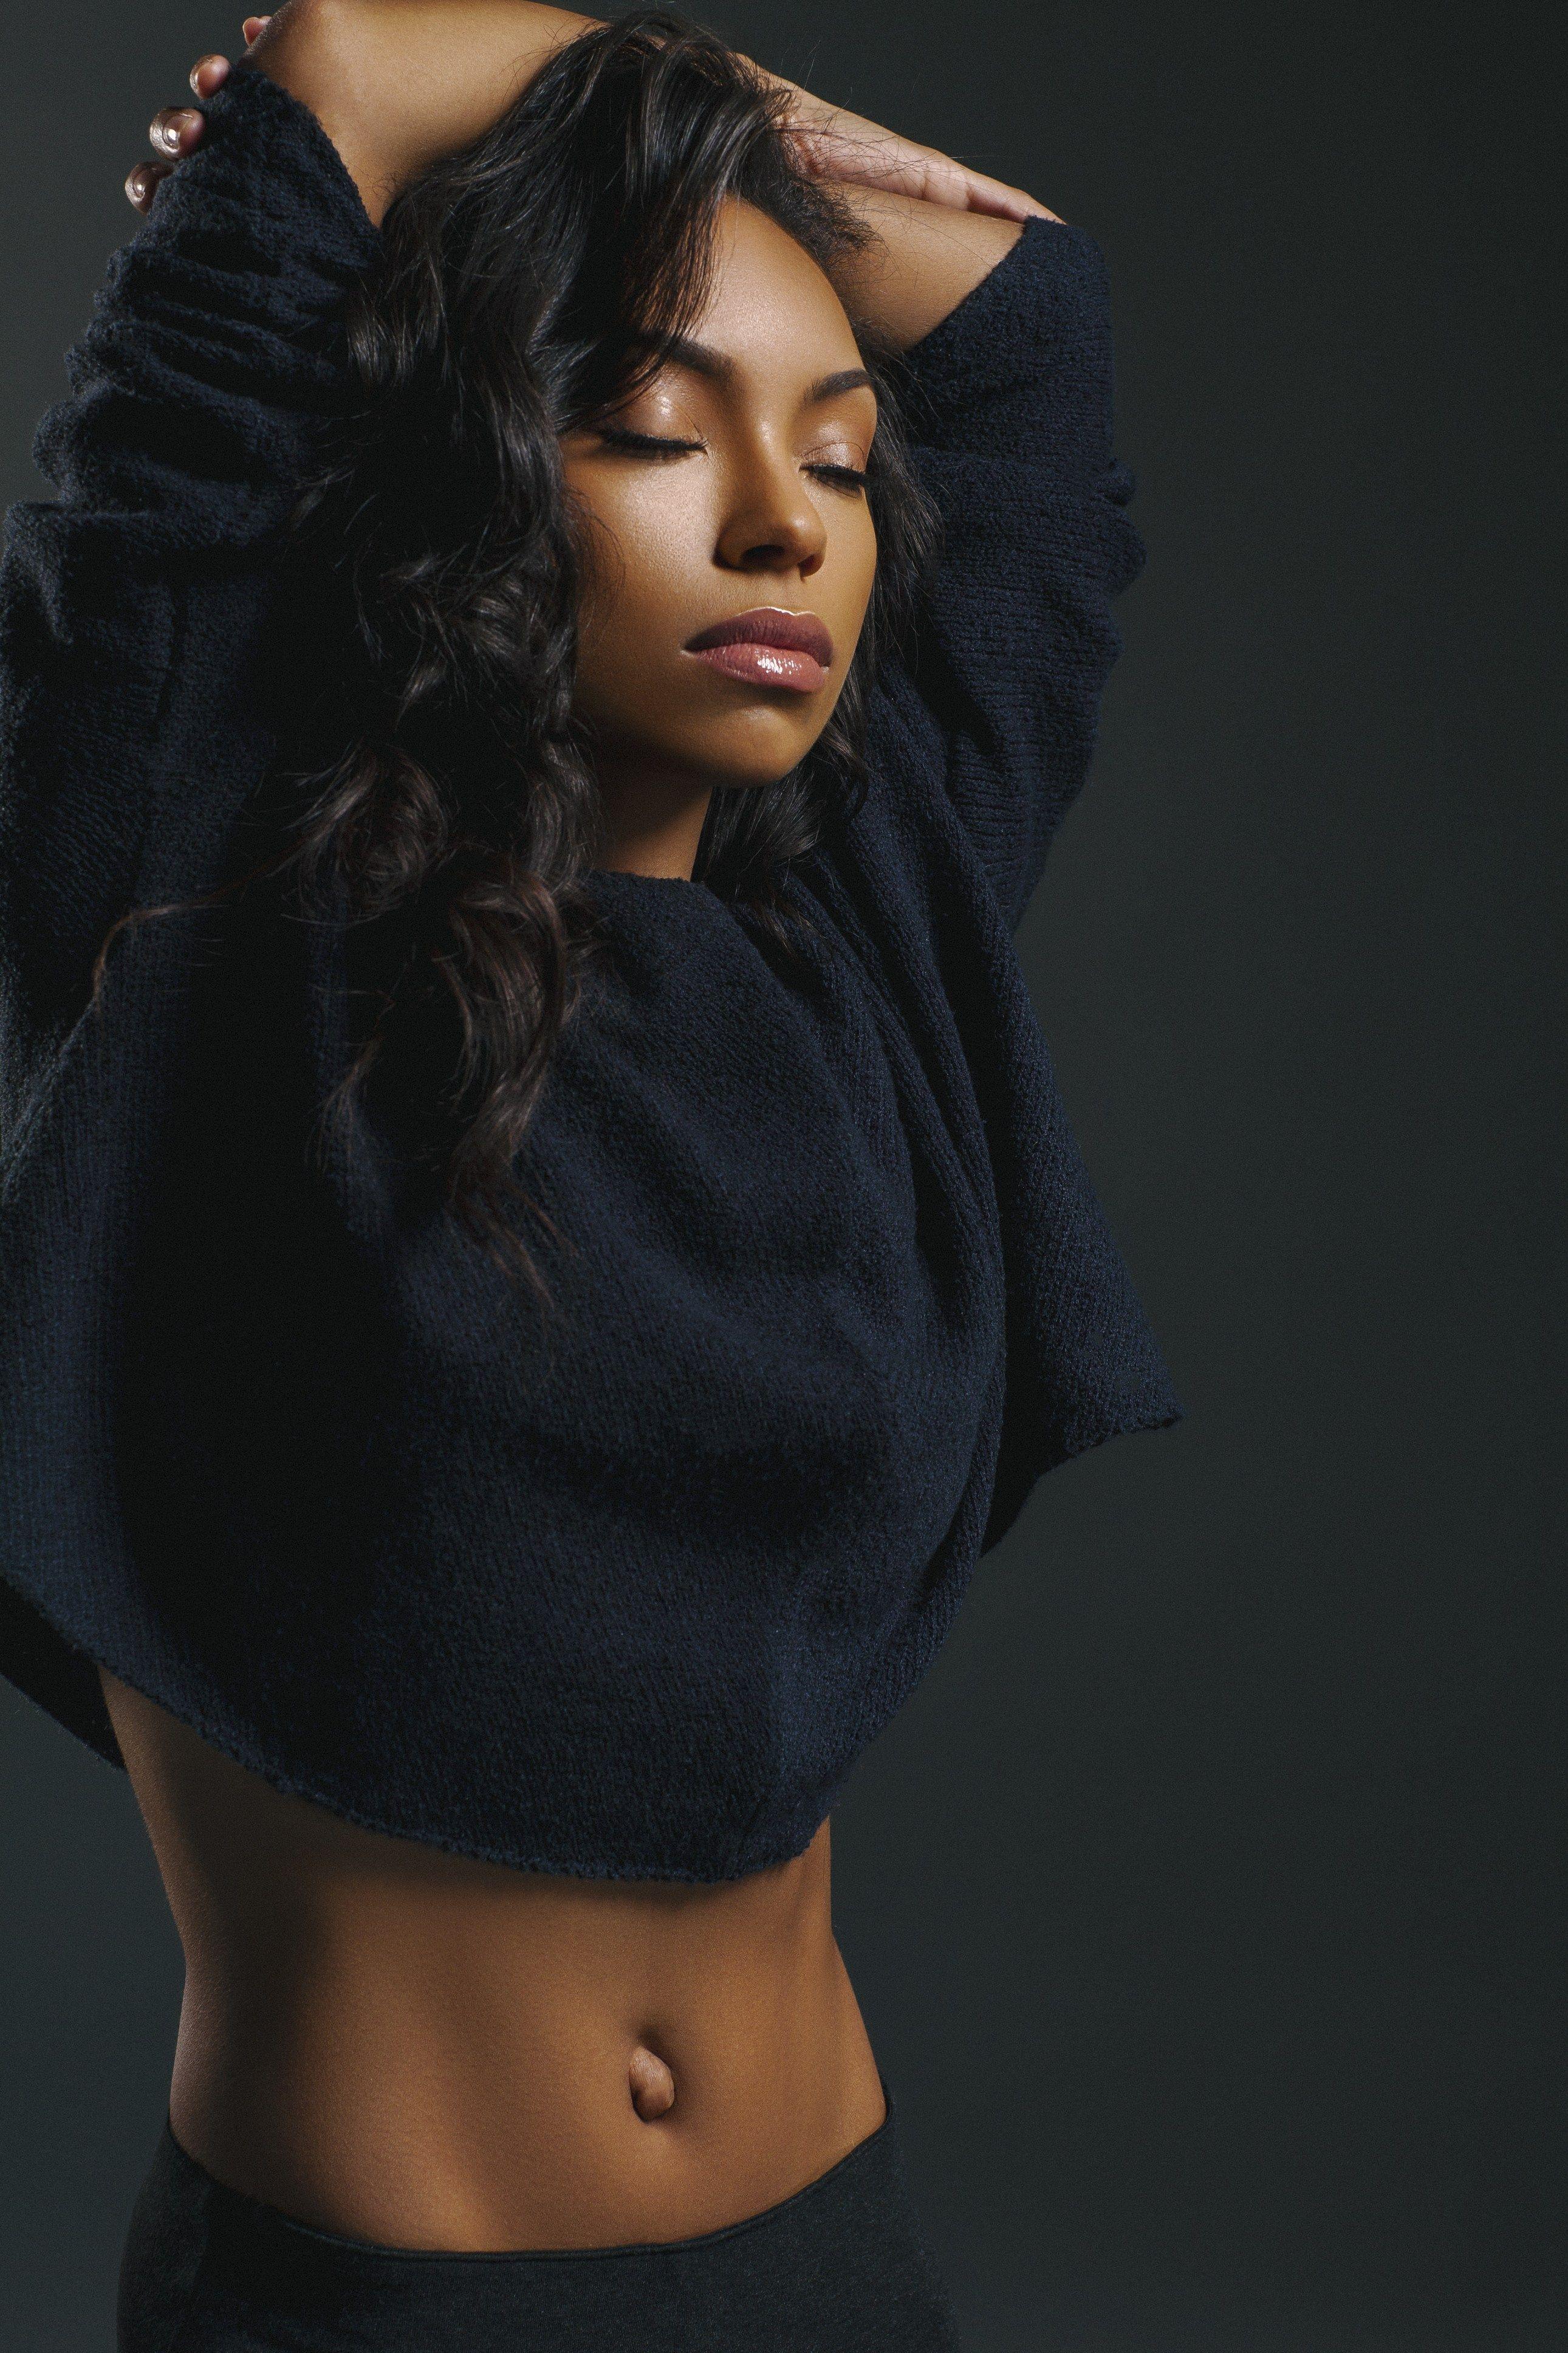 black-bad-girls-actresses-i-love-big-soft-sex